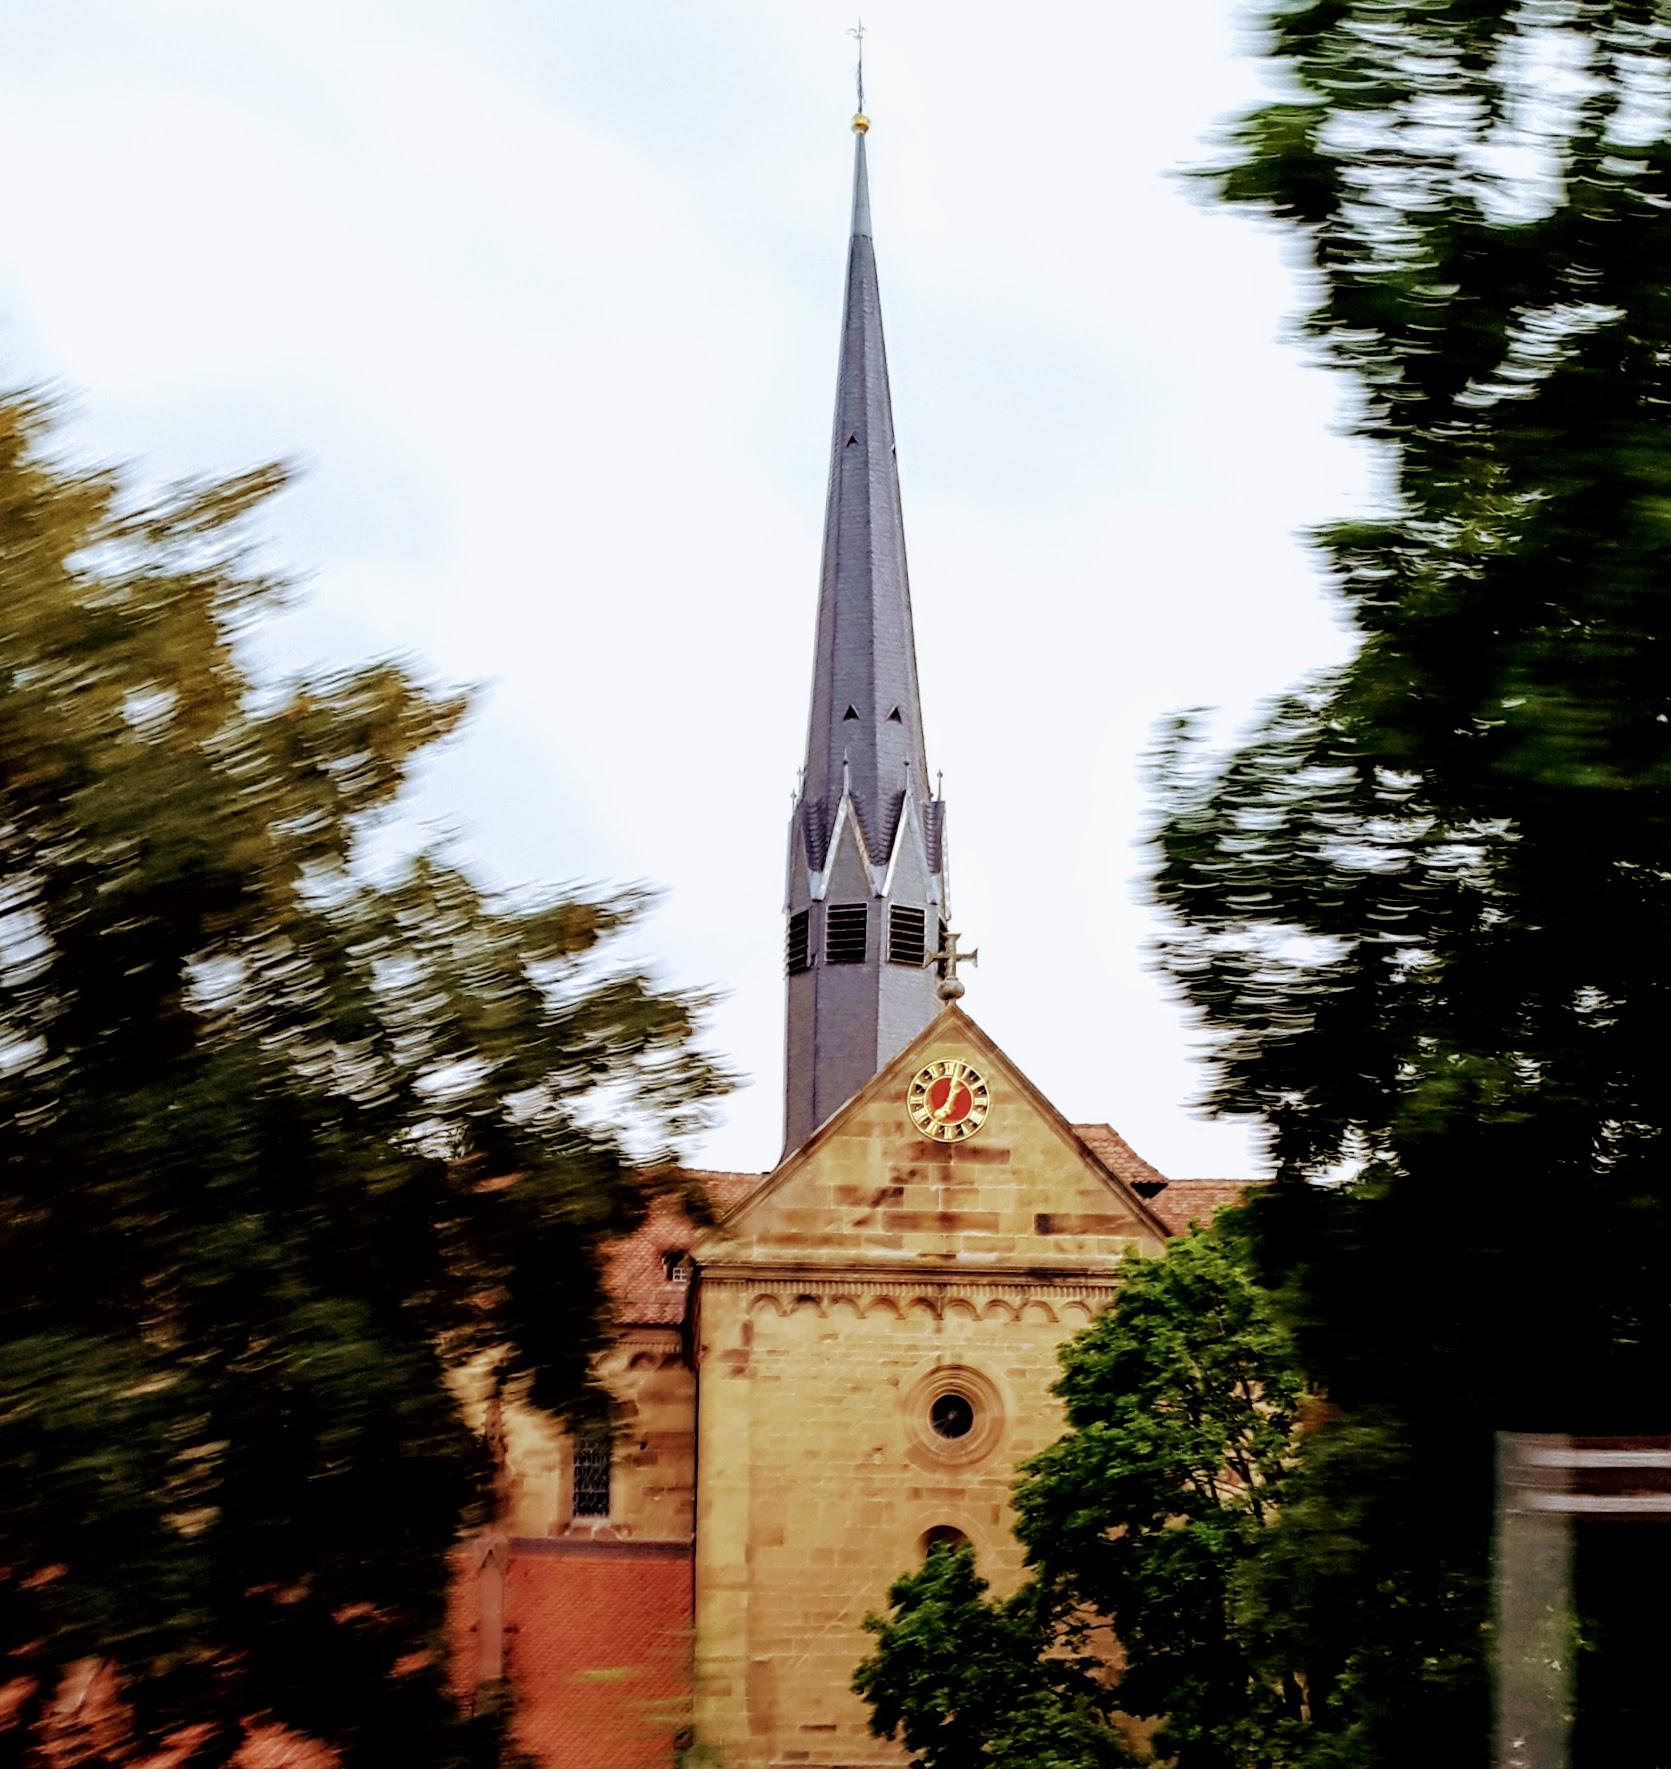 Daheim in Maulbronn